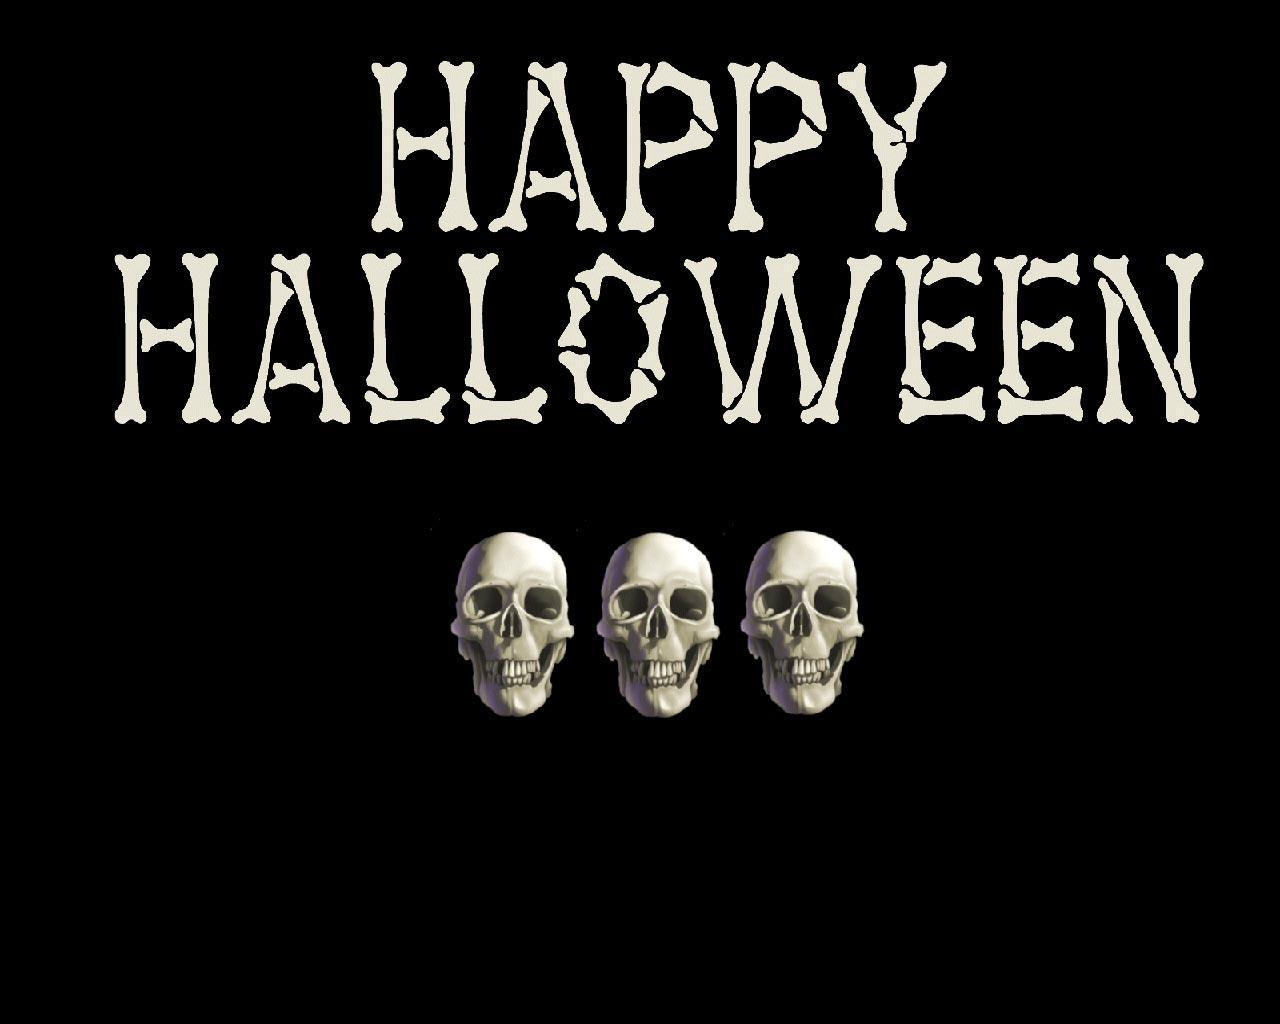 halloween skeleton wallpaper - photo #16